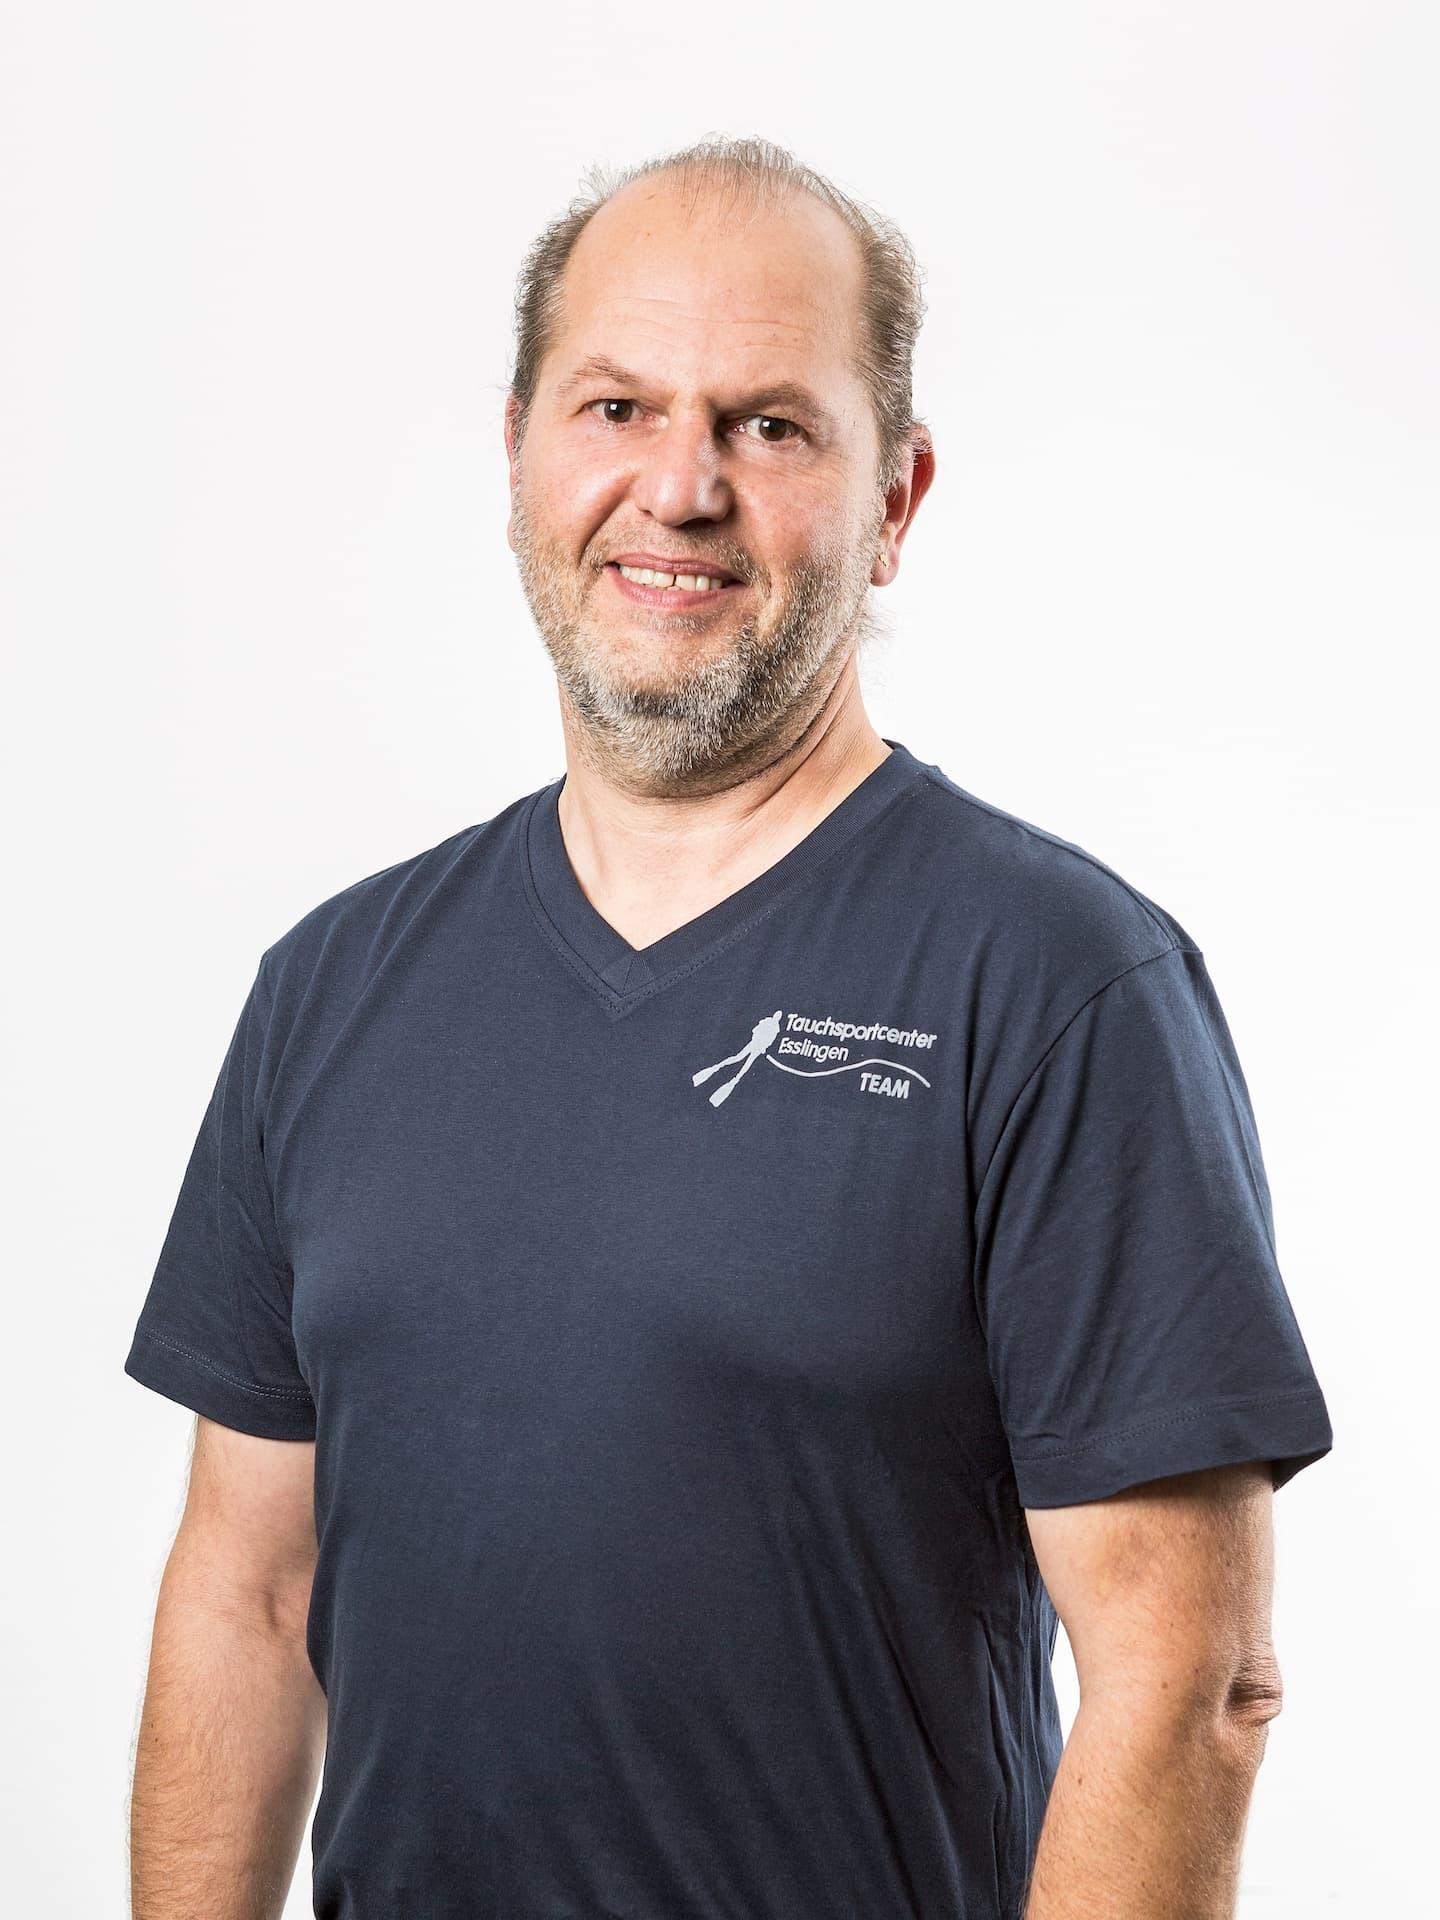 Armin Schmohl